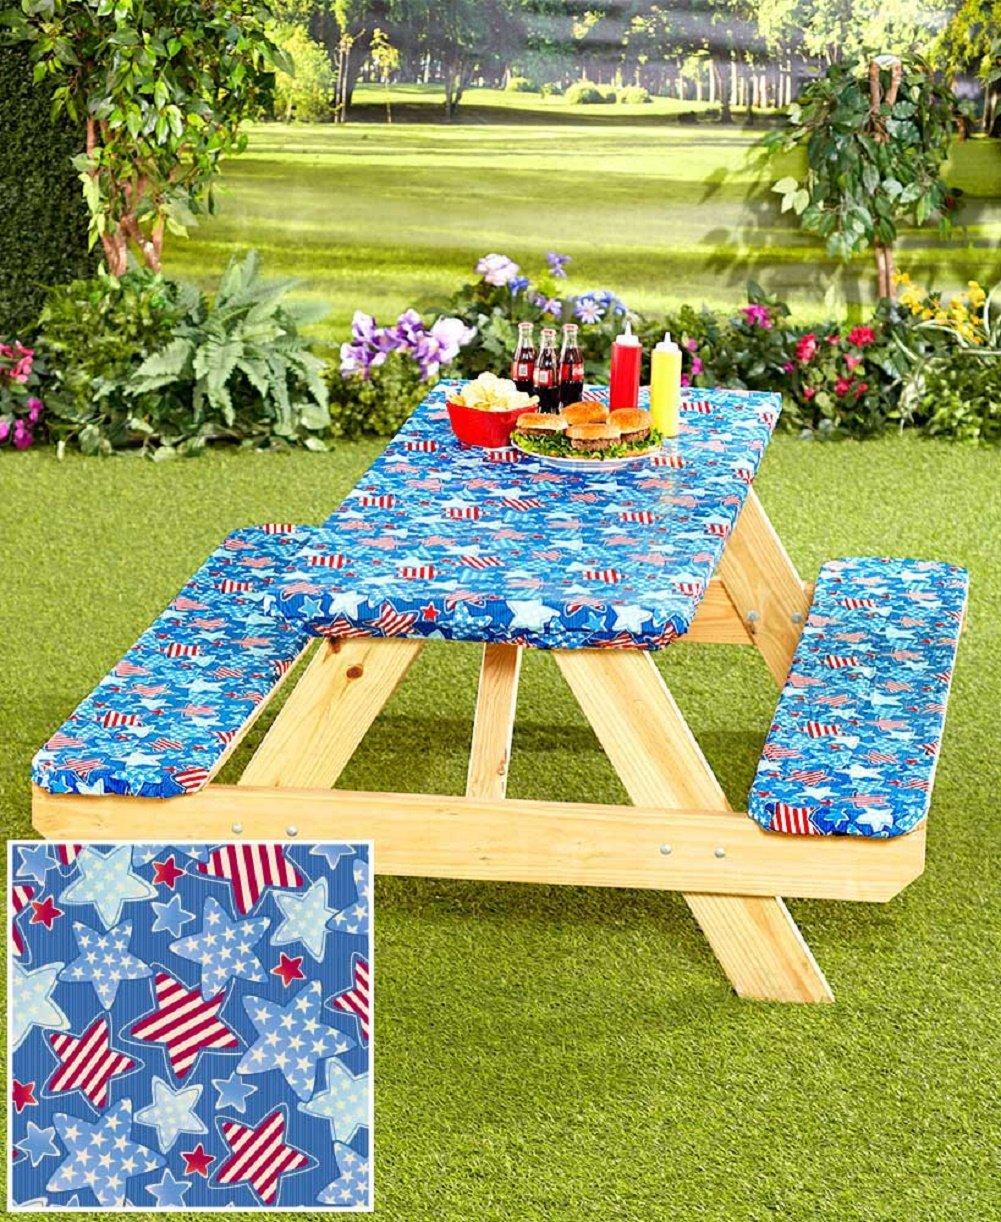 Amazon.com : 3 Pc. Picnic Table Covers (Americana Stars) : Garden U0026 Outdoor